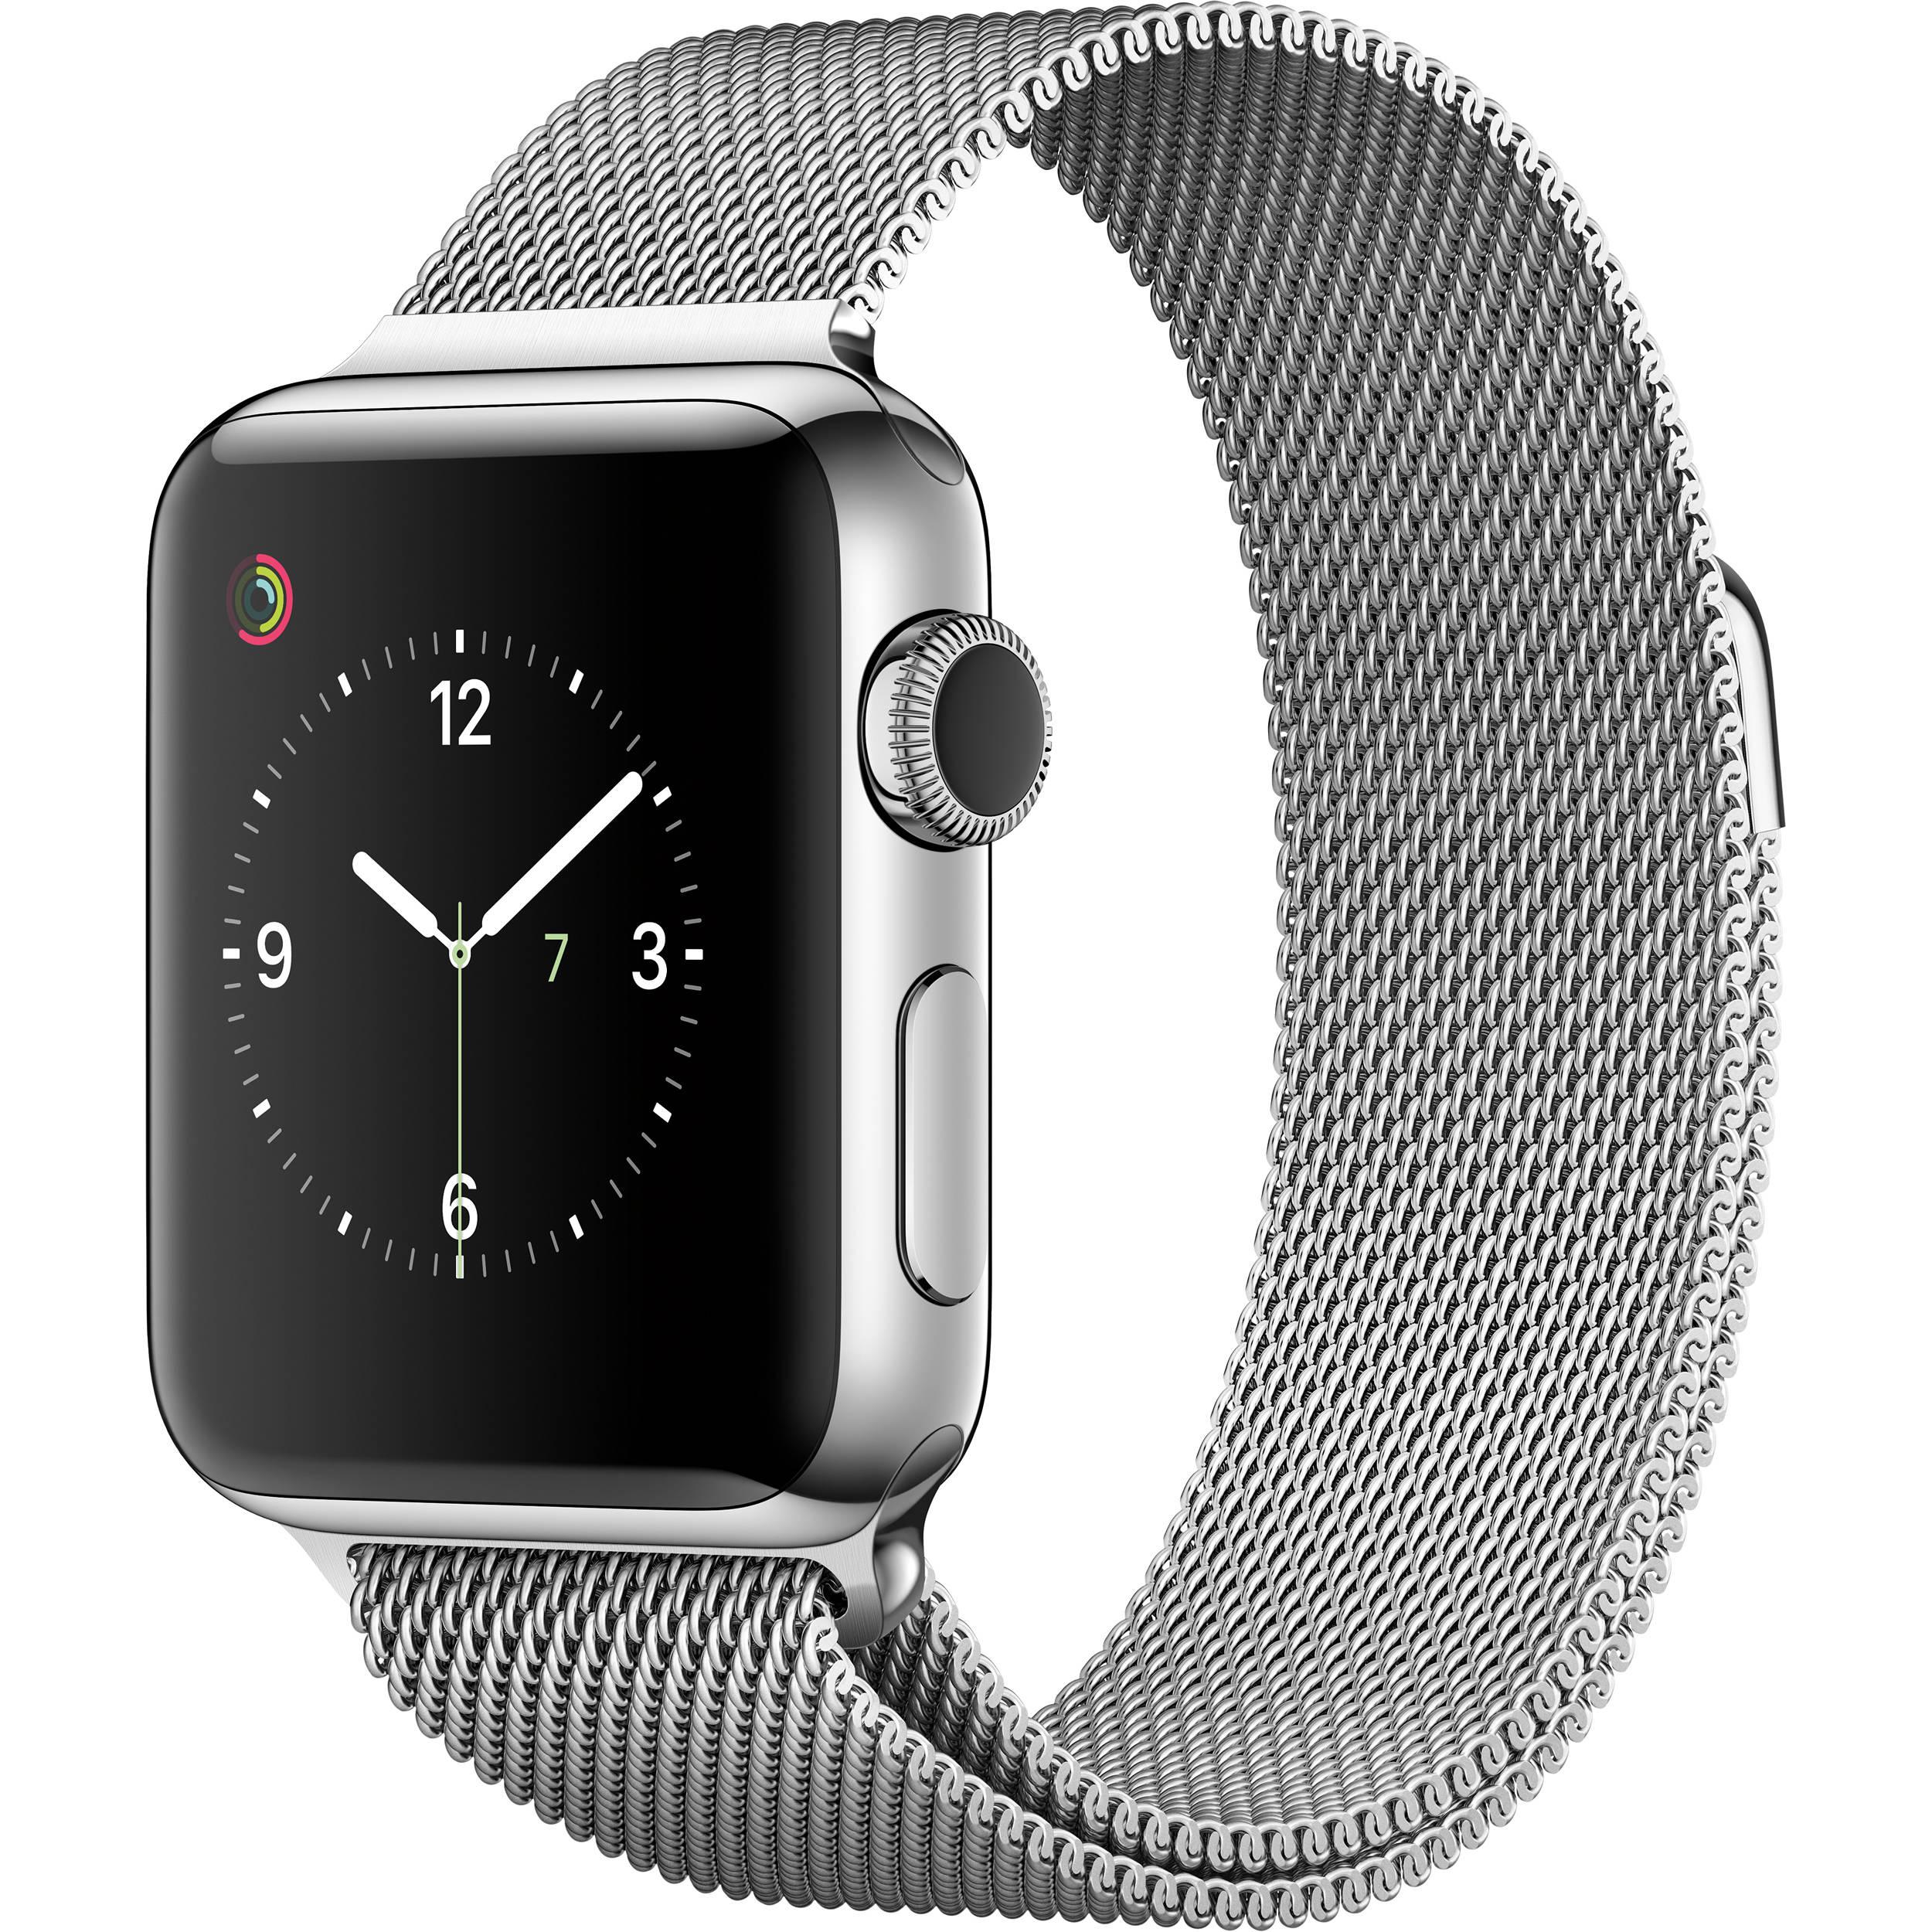 online store bdf96 8765c Apple Watch Series 2 38mm Smartwatch ( Stainless Steel Case, Milanese Loop  Band)